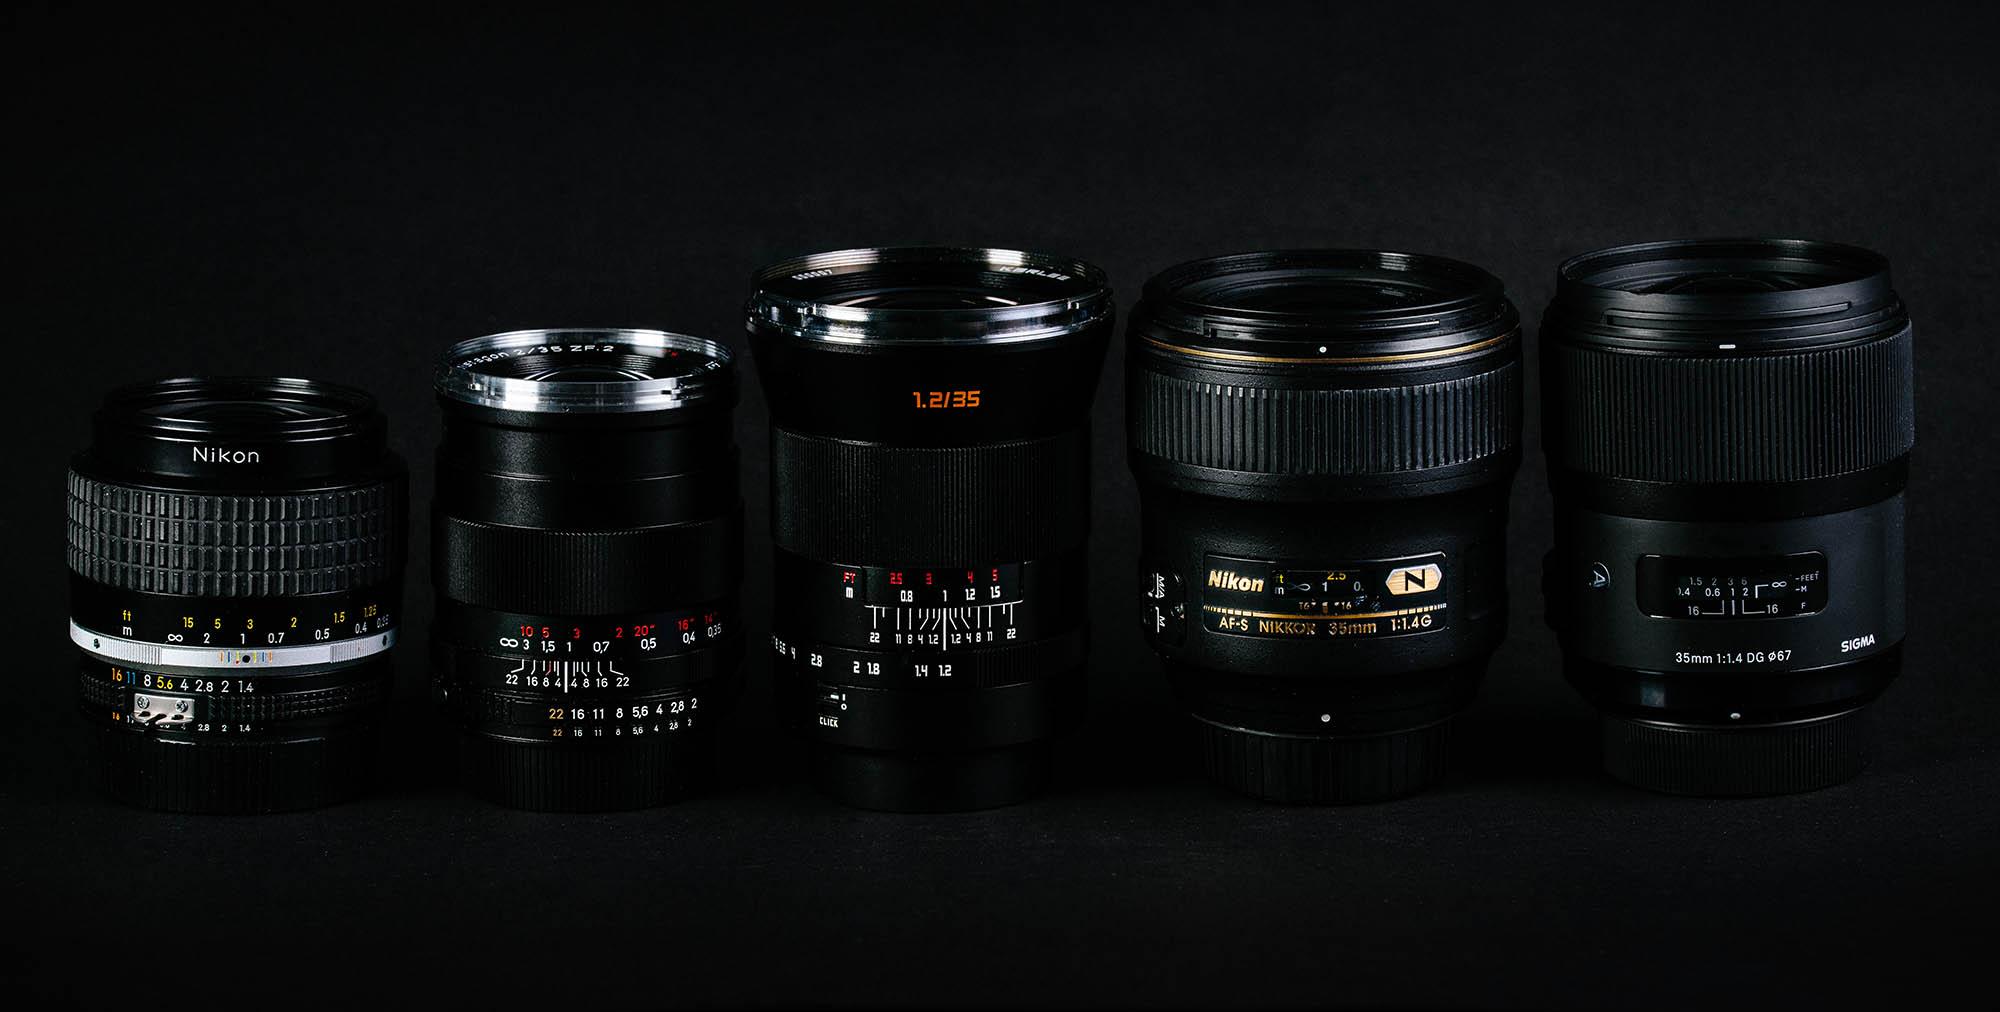 Lens Reviews Page 2 Review By Richard Petzval 85 F 22 Bokeh Control Brass 35mm Prime Shootout